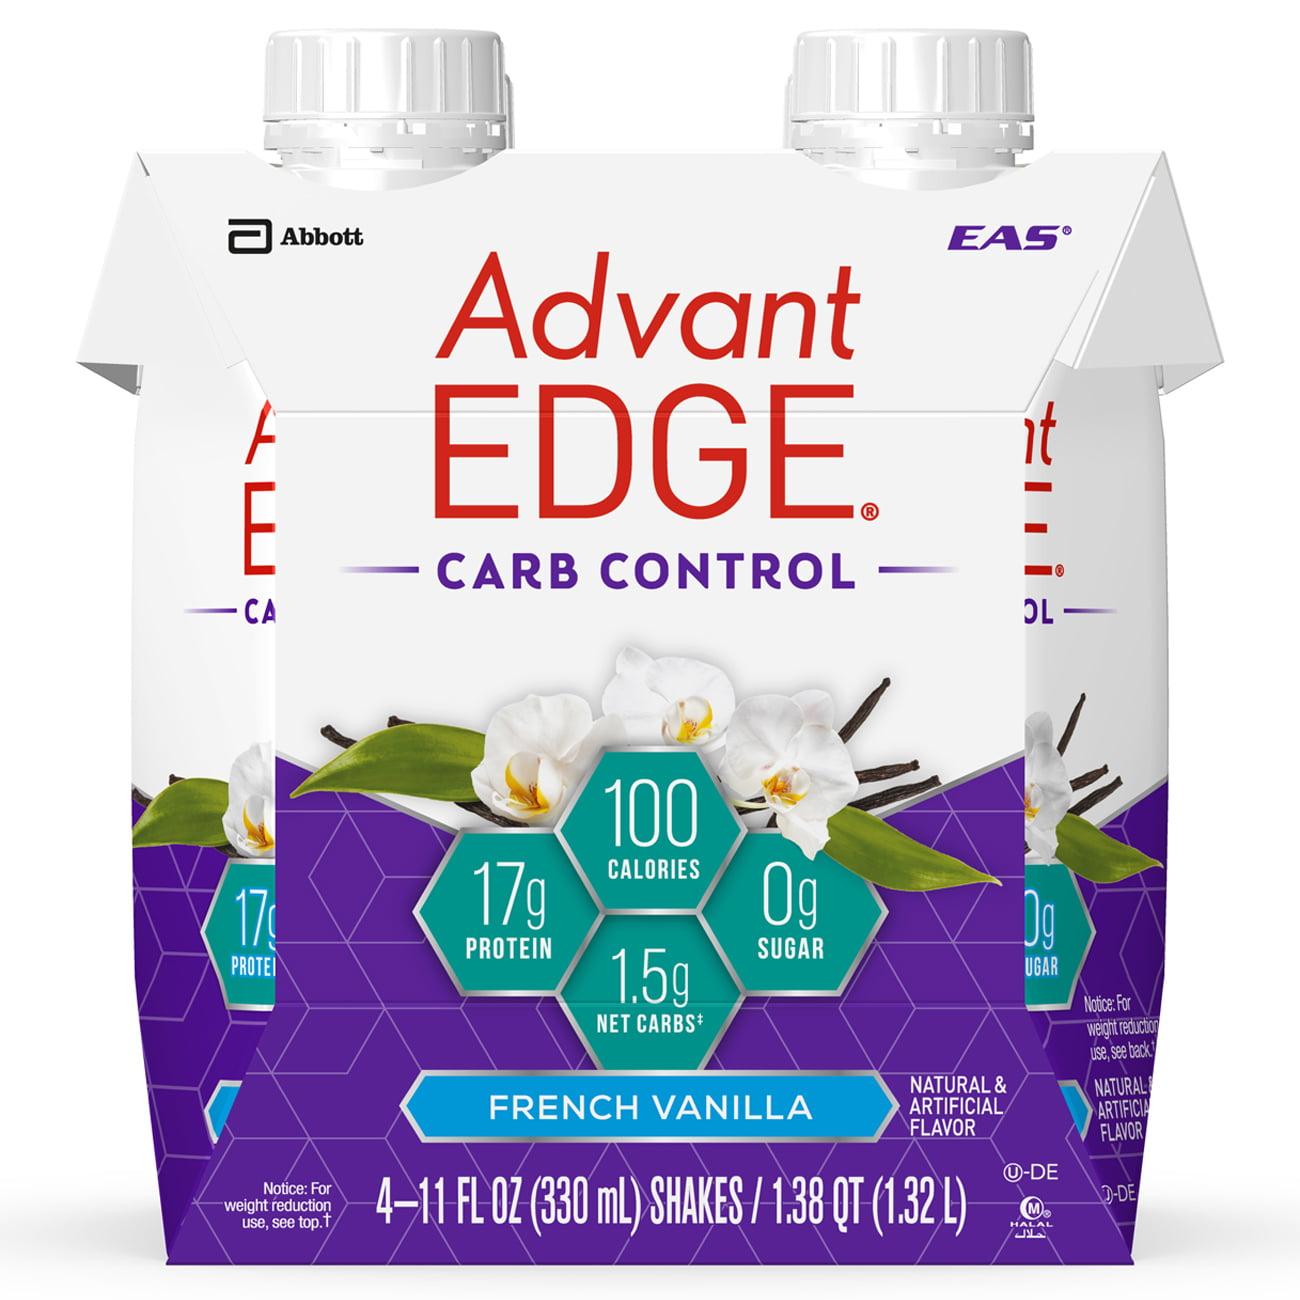 EAS AdvantEDGE Carb Control Protein Shake, French Vanilla, 17g Protein, 4 Ct